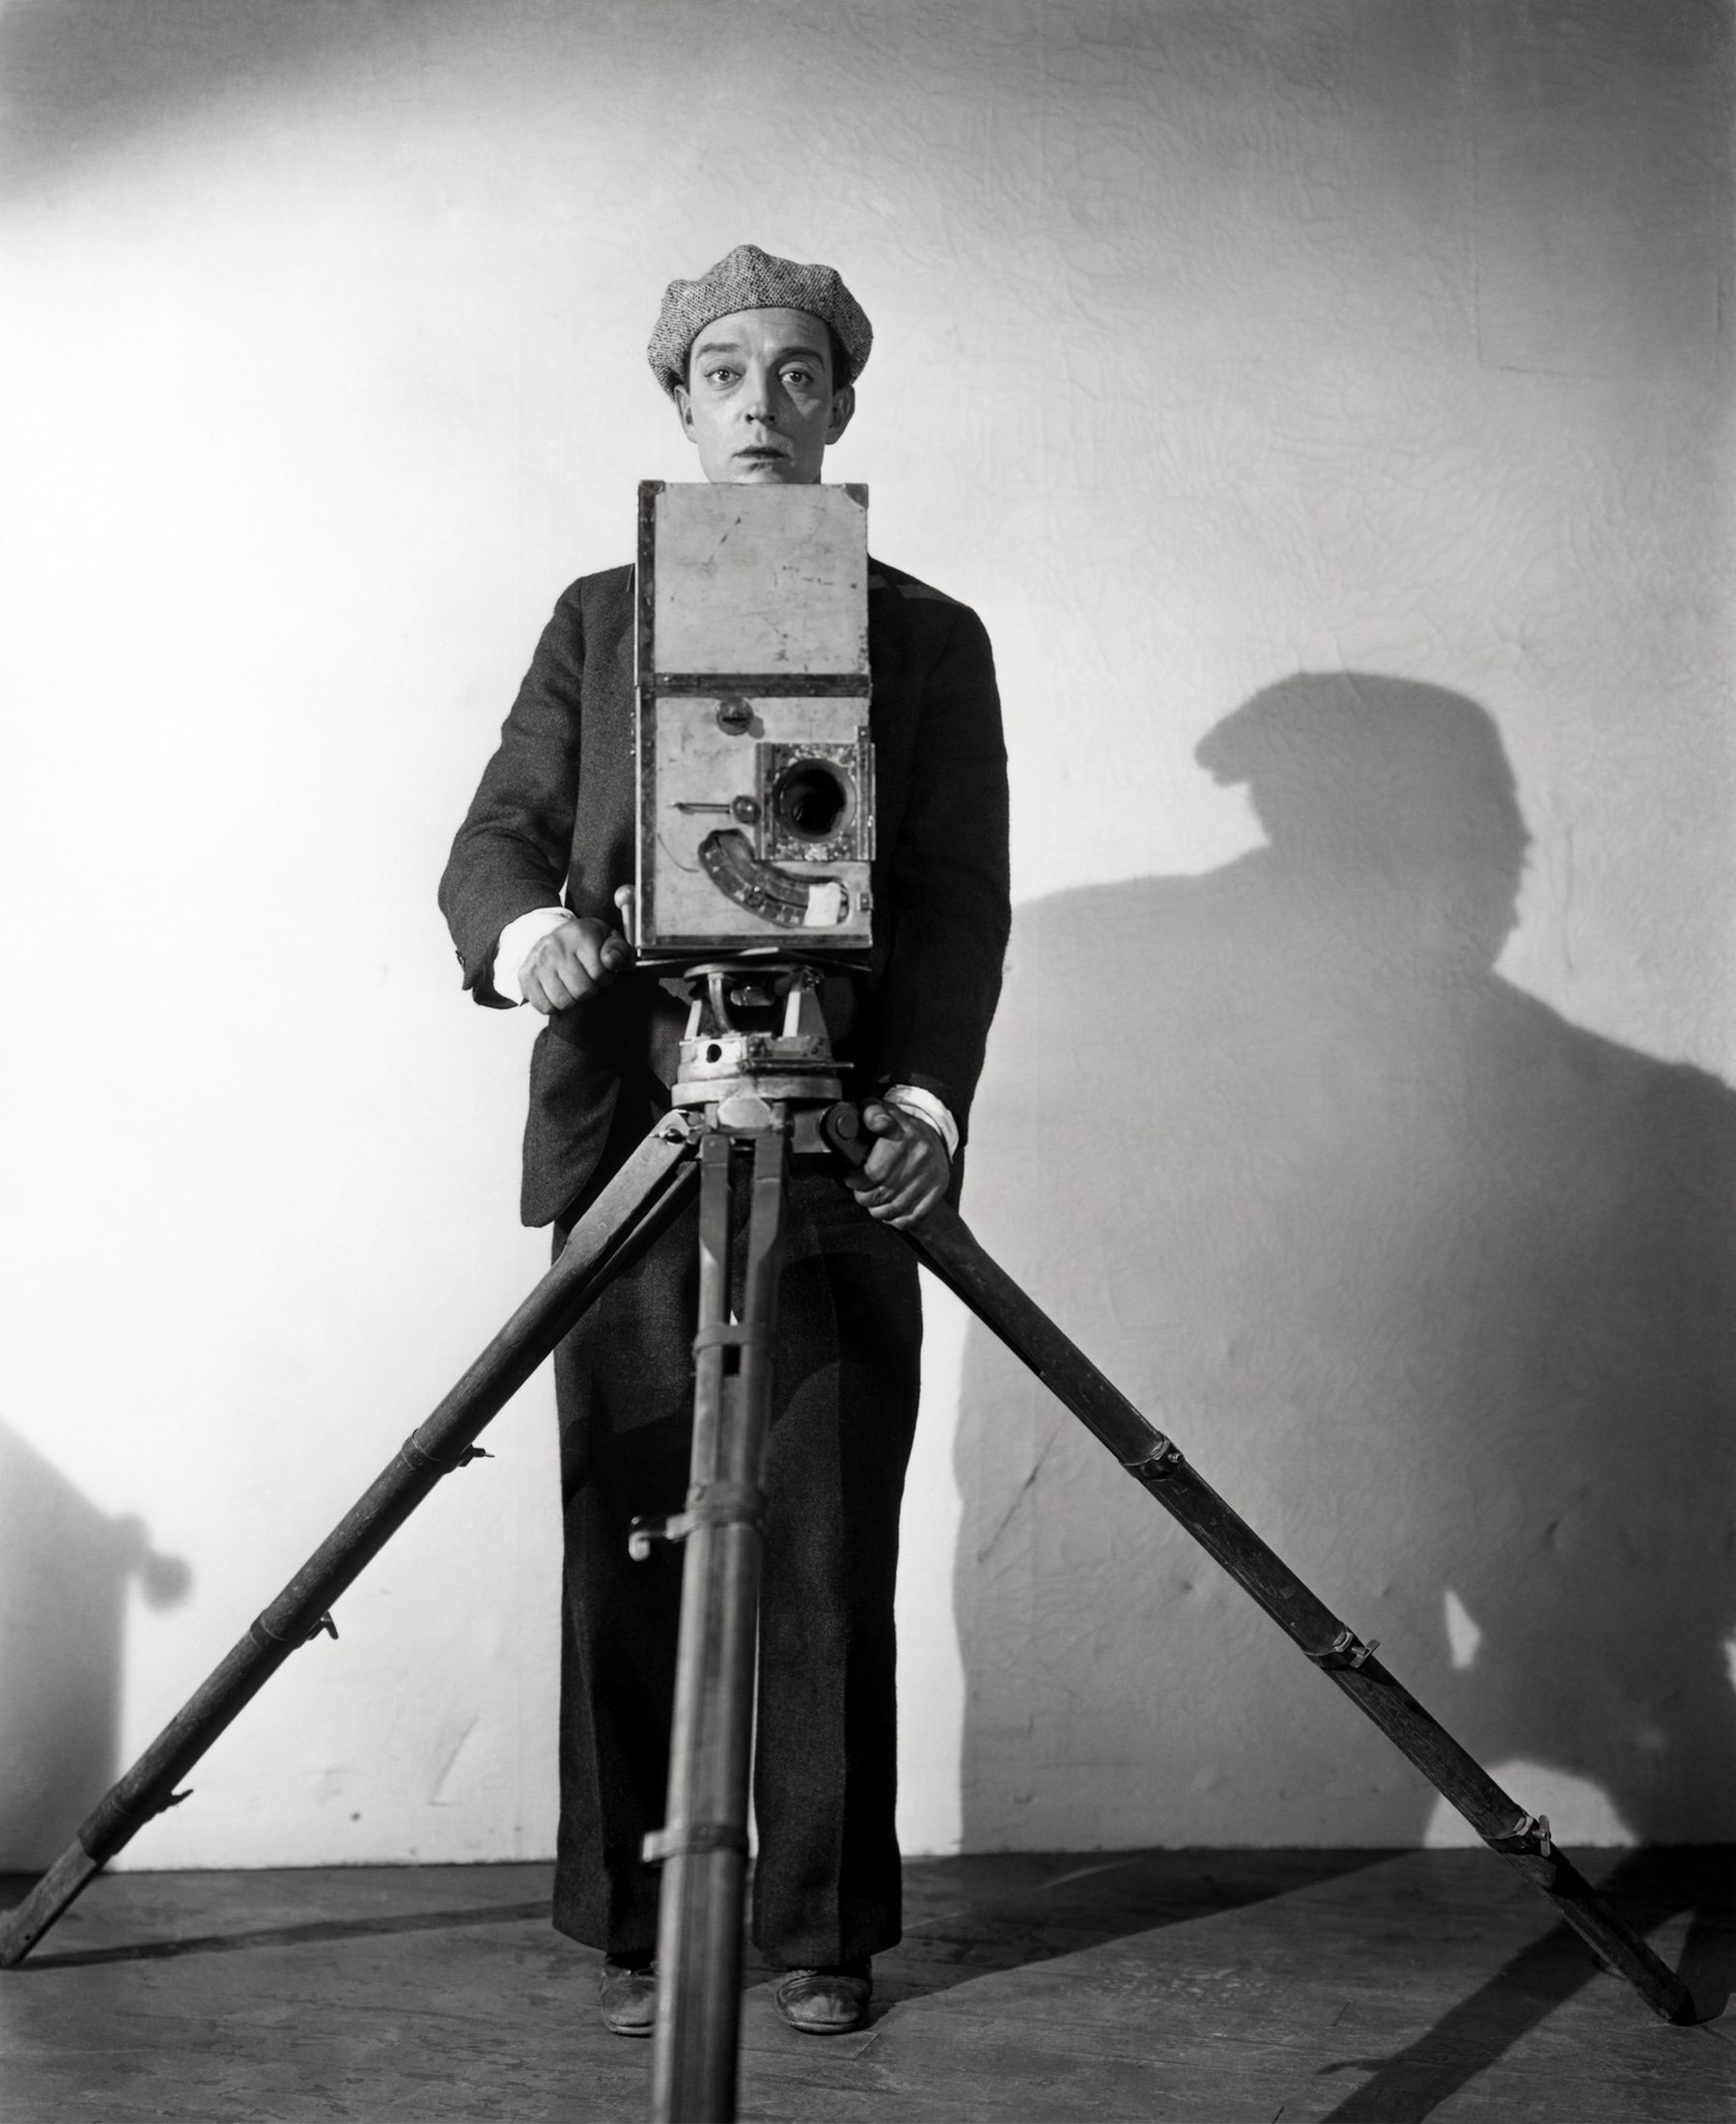 <p>Le Cameraman (The Cameraman, 1928)</p>